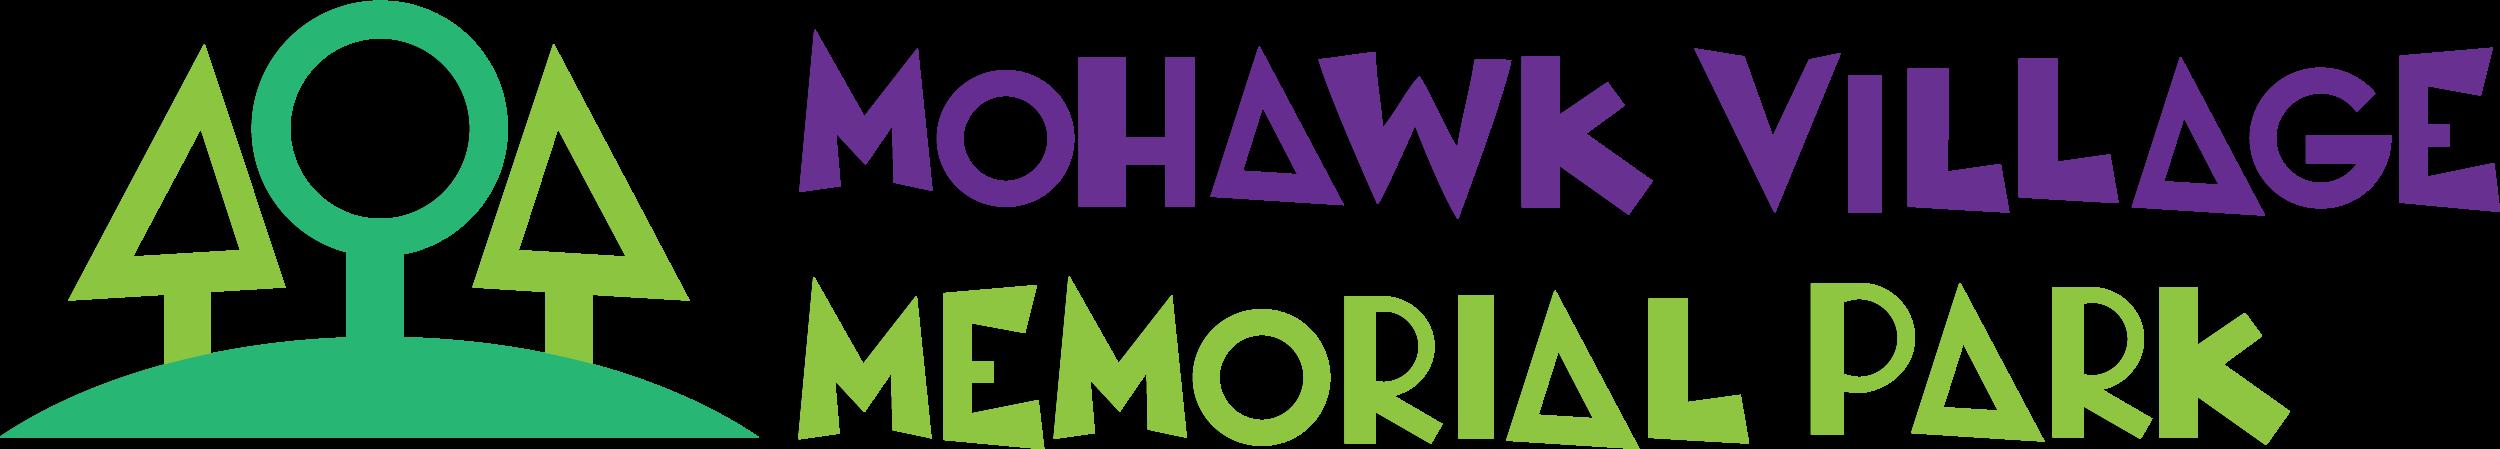 Mohawk Village Memorial Park